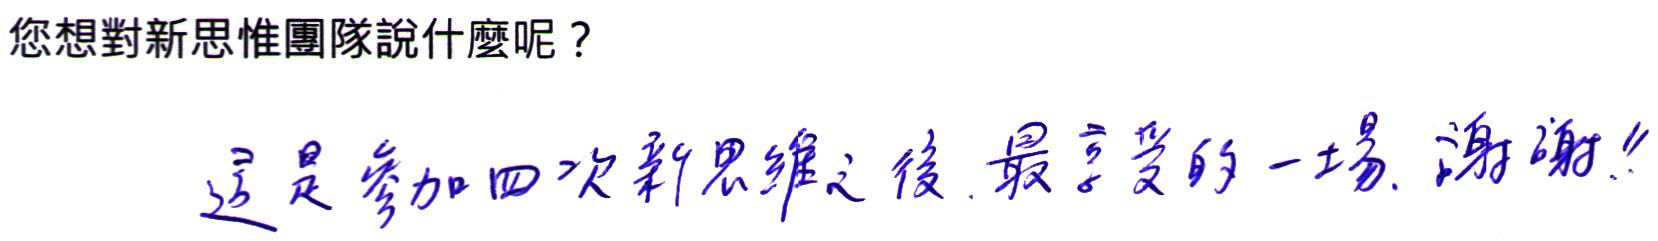 20170924_YMRF_feedback_00008